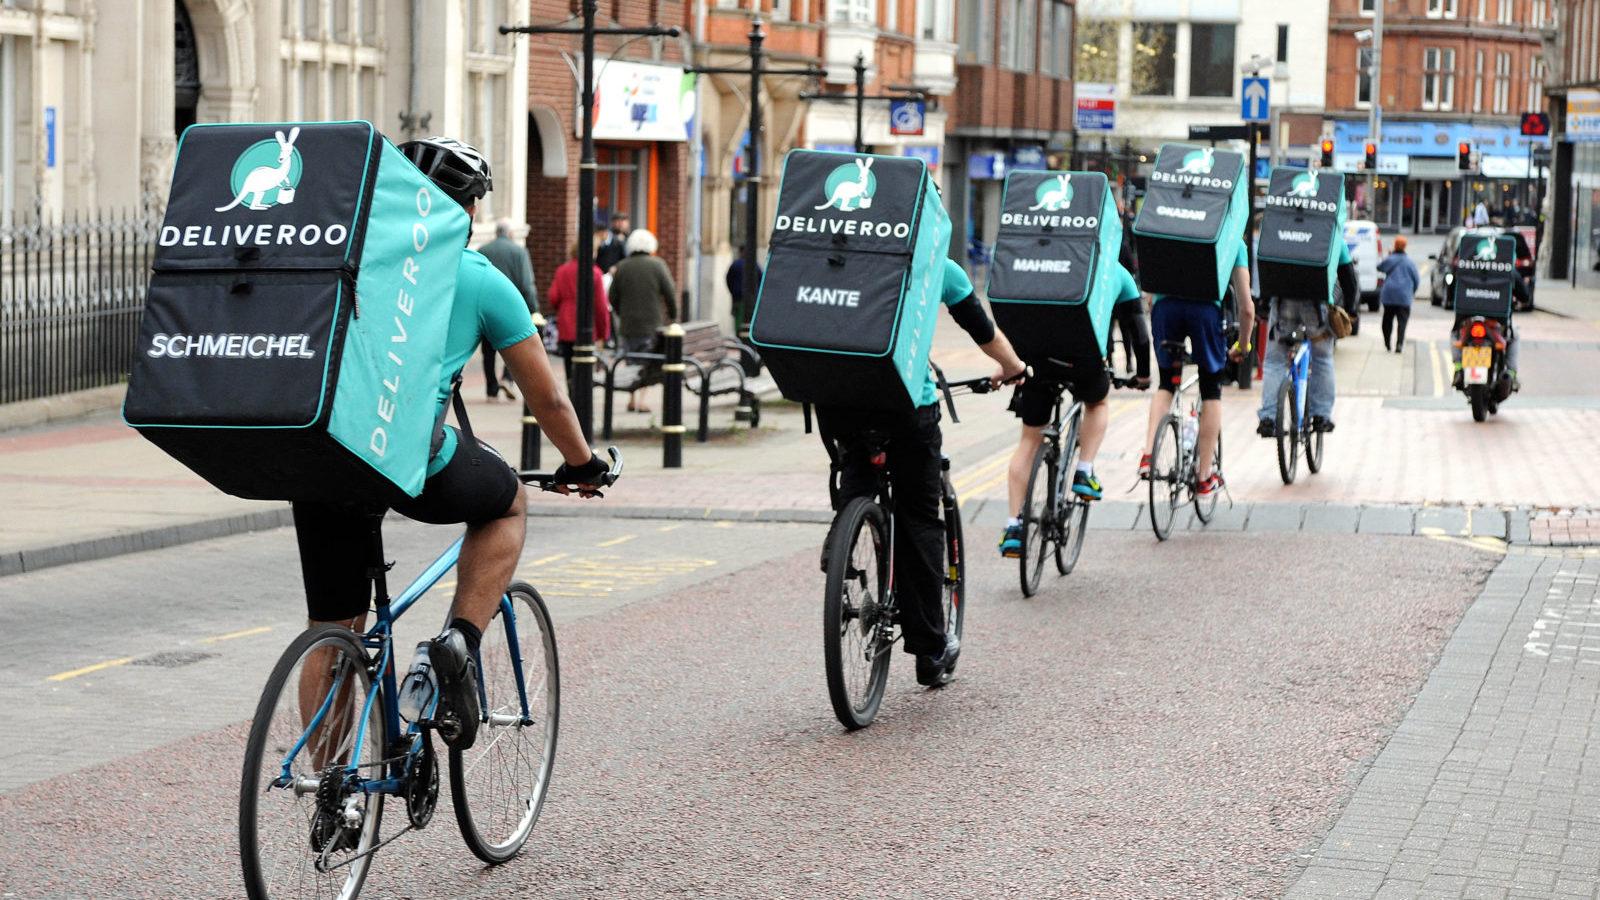 Deliveroo: Η επένδυση της Amazon αλλάζει όλο το story της εταιρείας